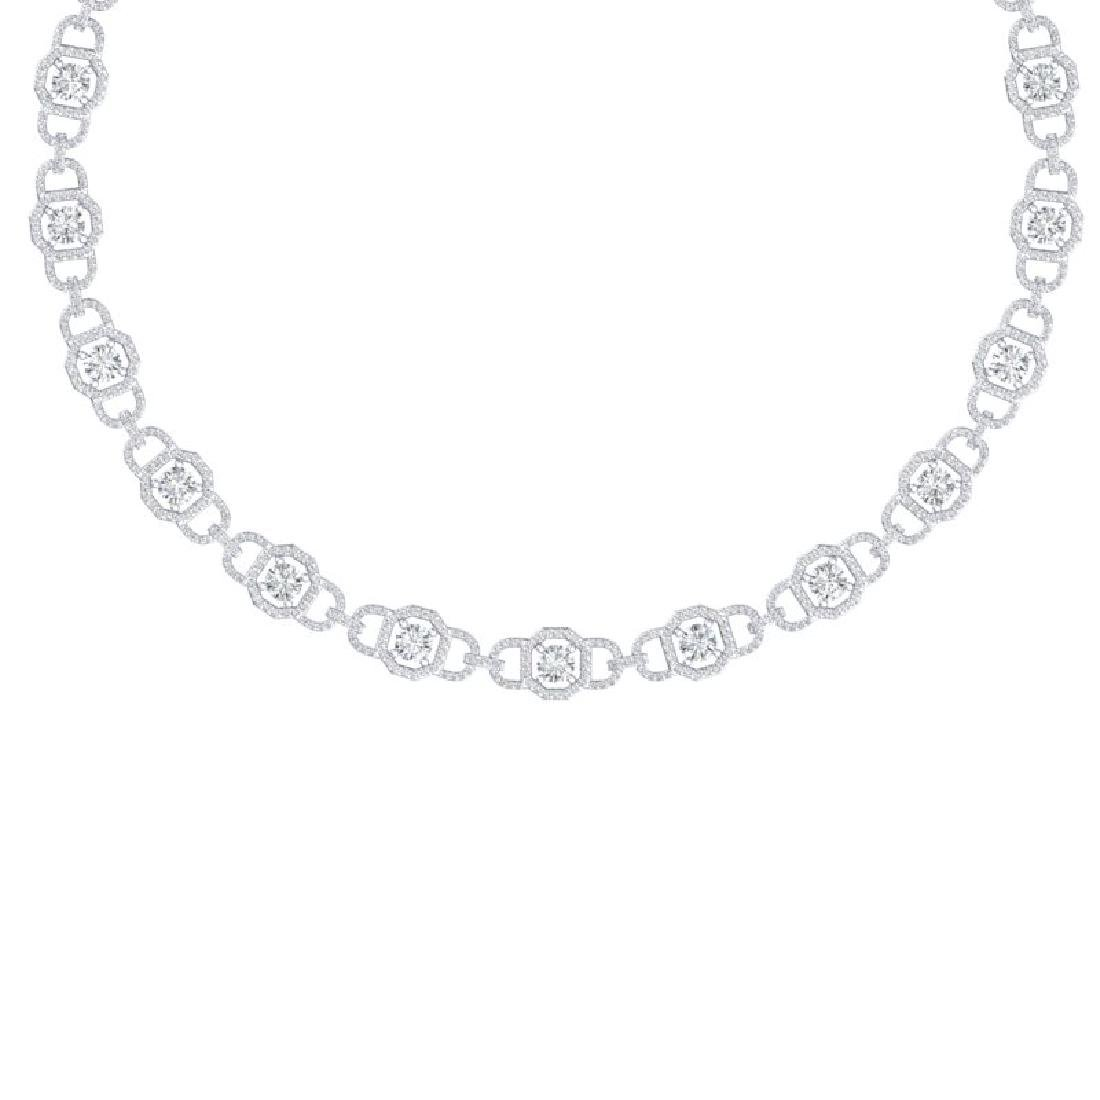 25 CTW Certified SI/I Diamond Halo Necklace 18K White